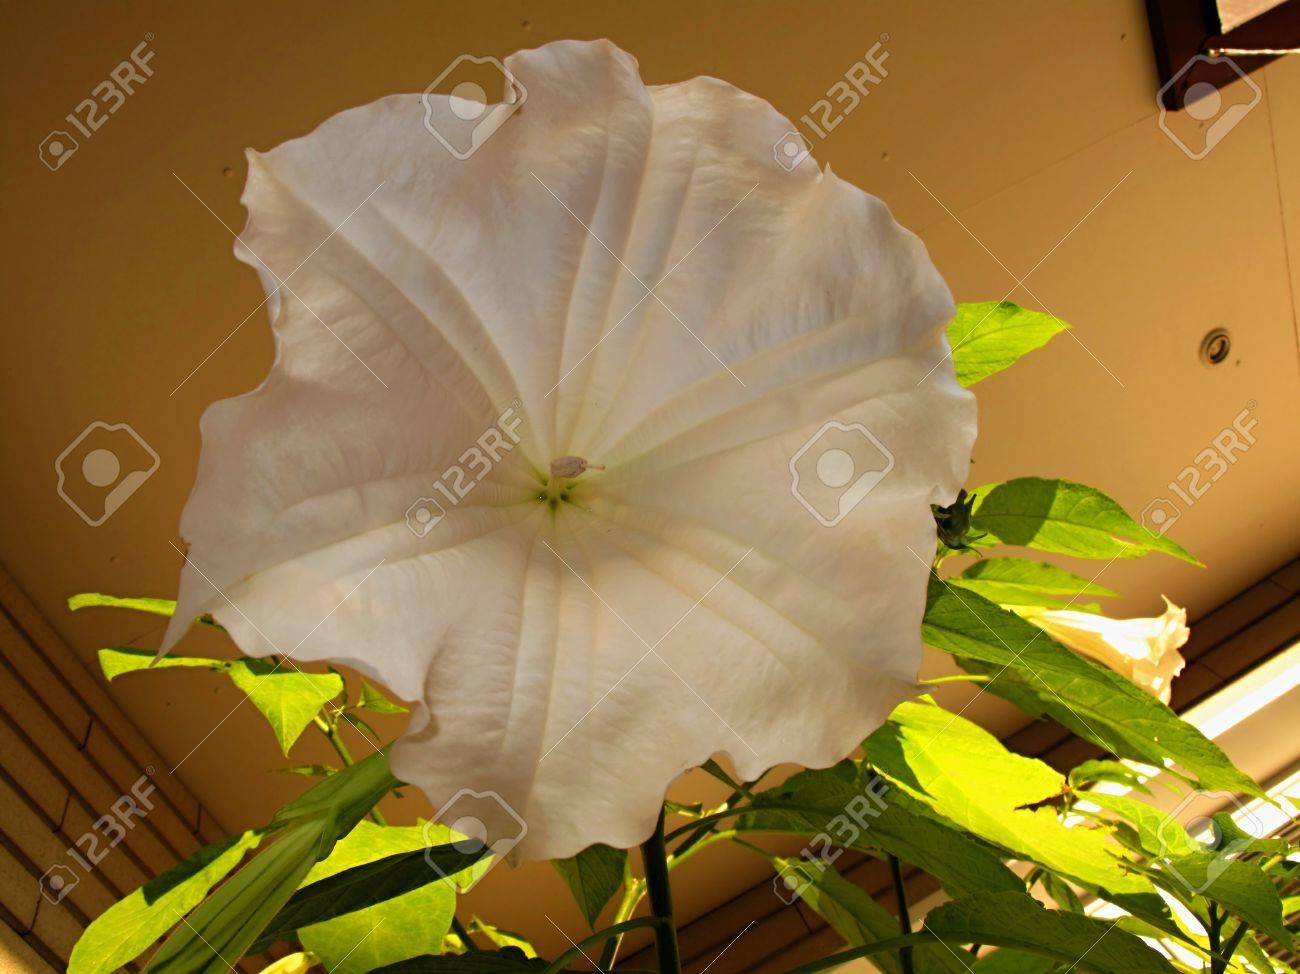 Datura datura white flower detail stock photo picture and royalty datura datura white flower detail stock photo 10626836 mightylinksfo